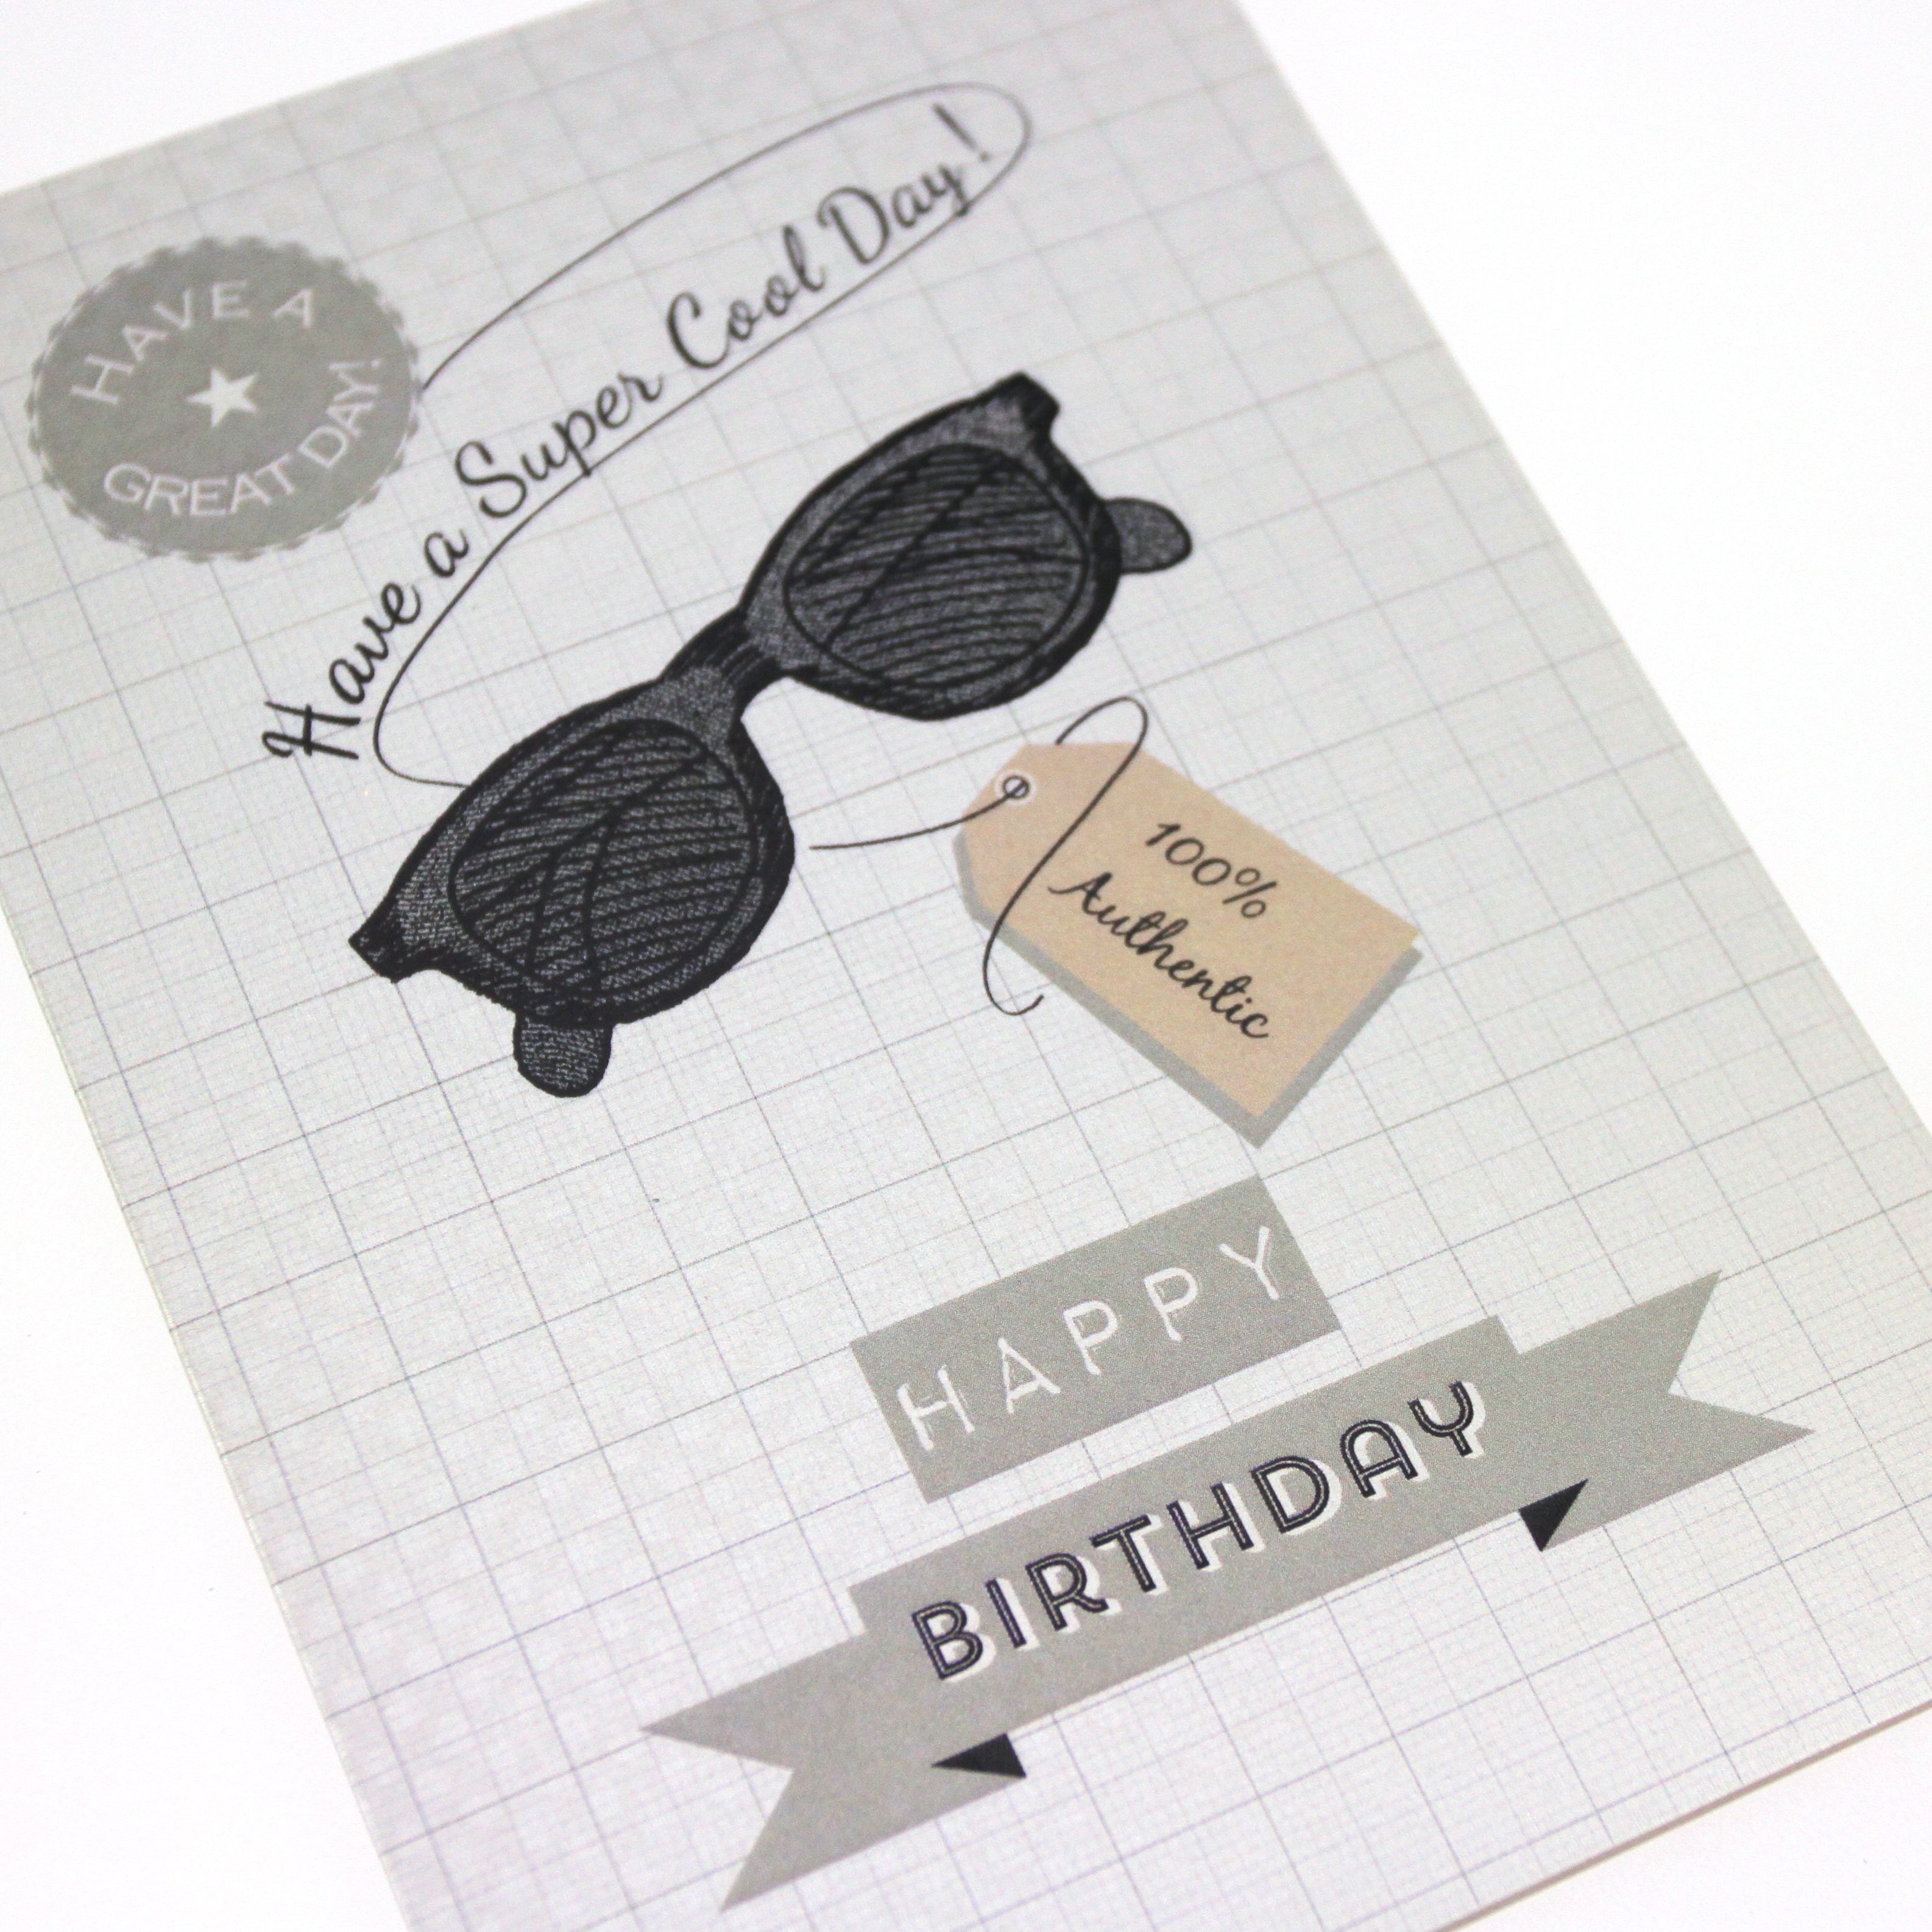 Mens printed birthday card retro vintage hipster tag sunglasses